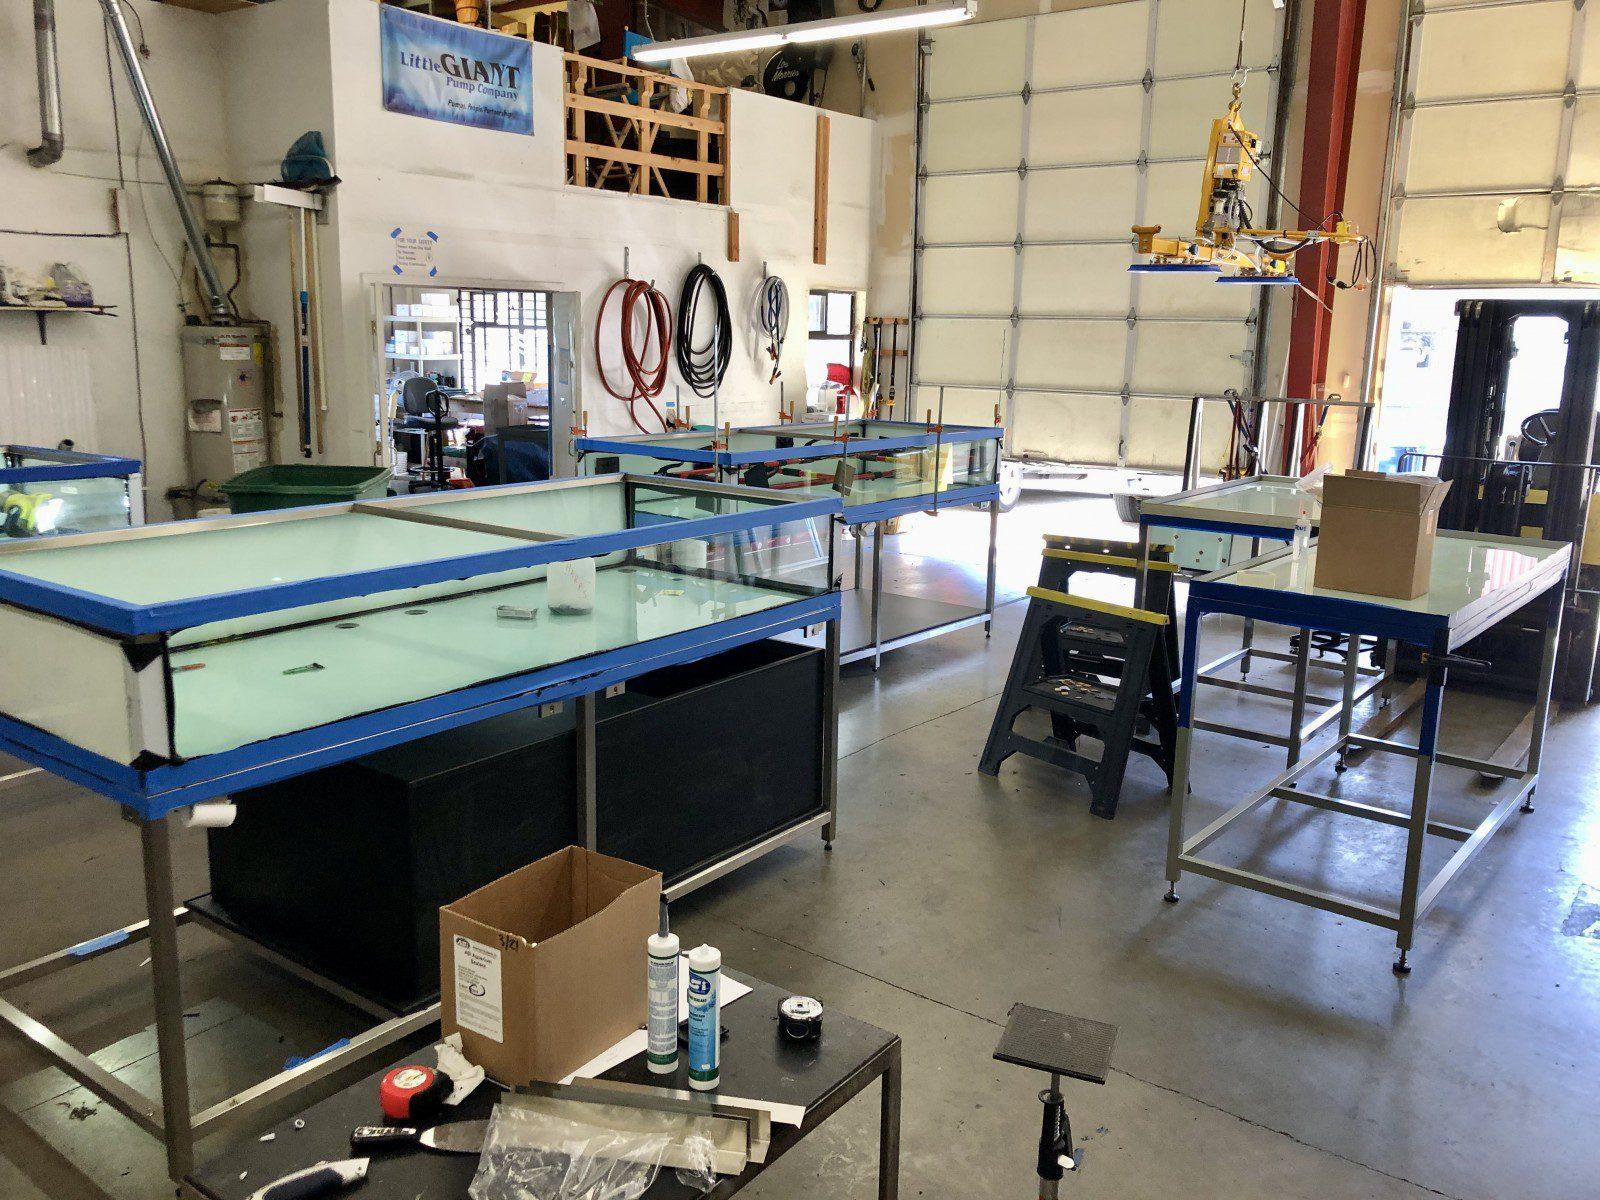 Aquatic Enterprises, Washington